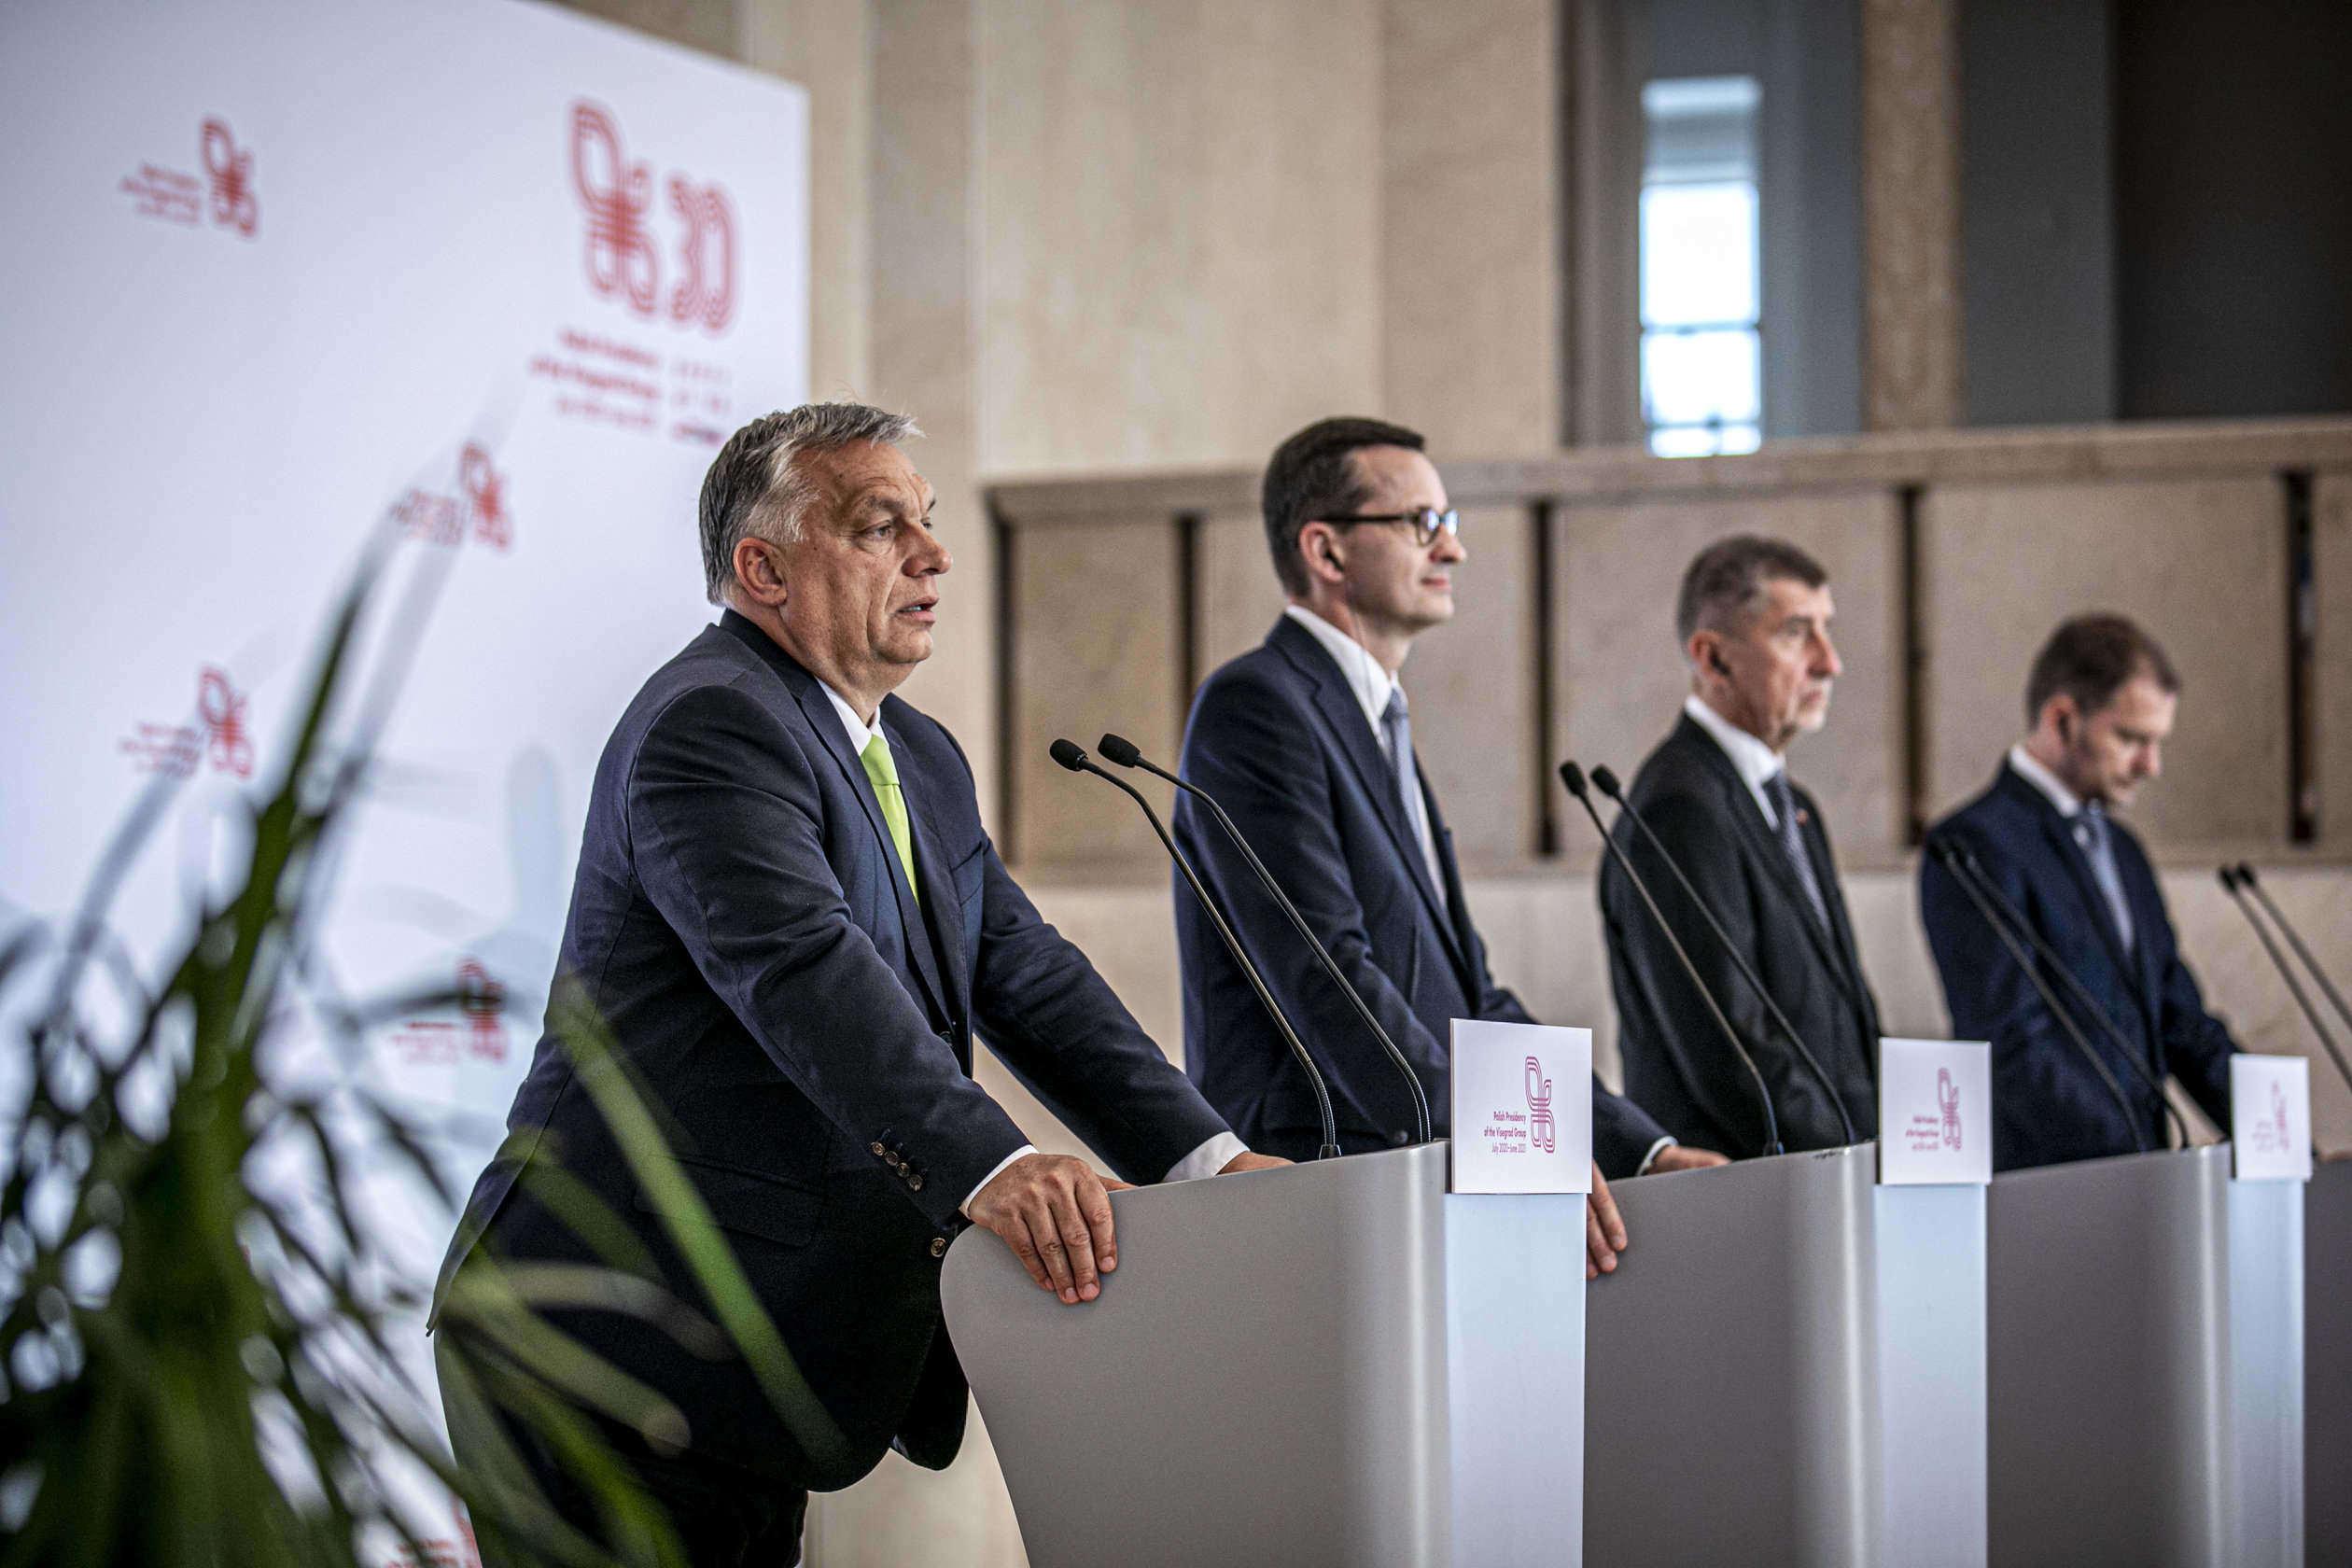 orbán v4 meeting